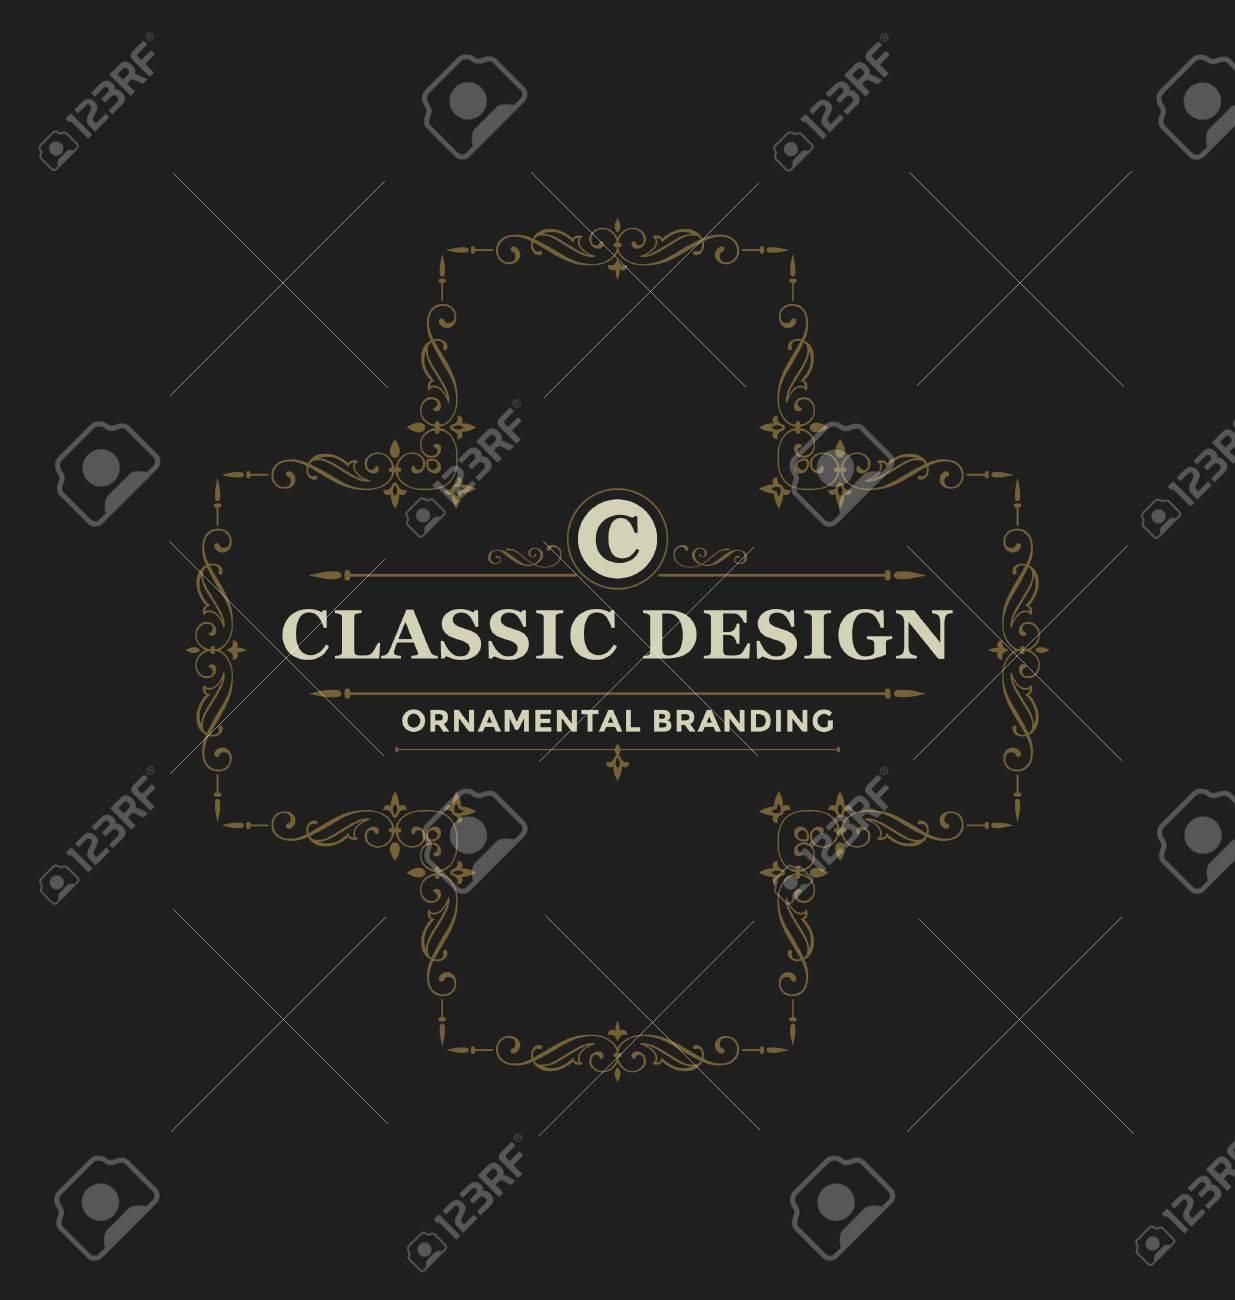 Calligraphic Label Design Template - Classic Ornamental Style ...